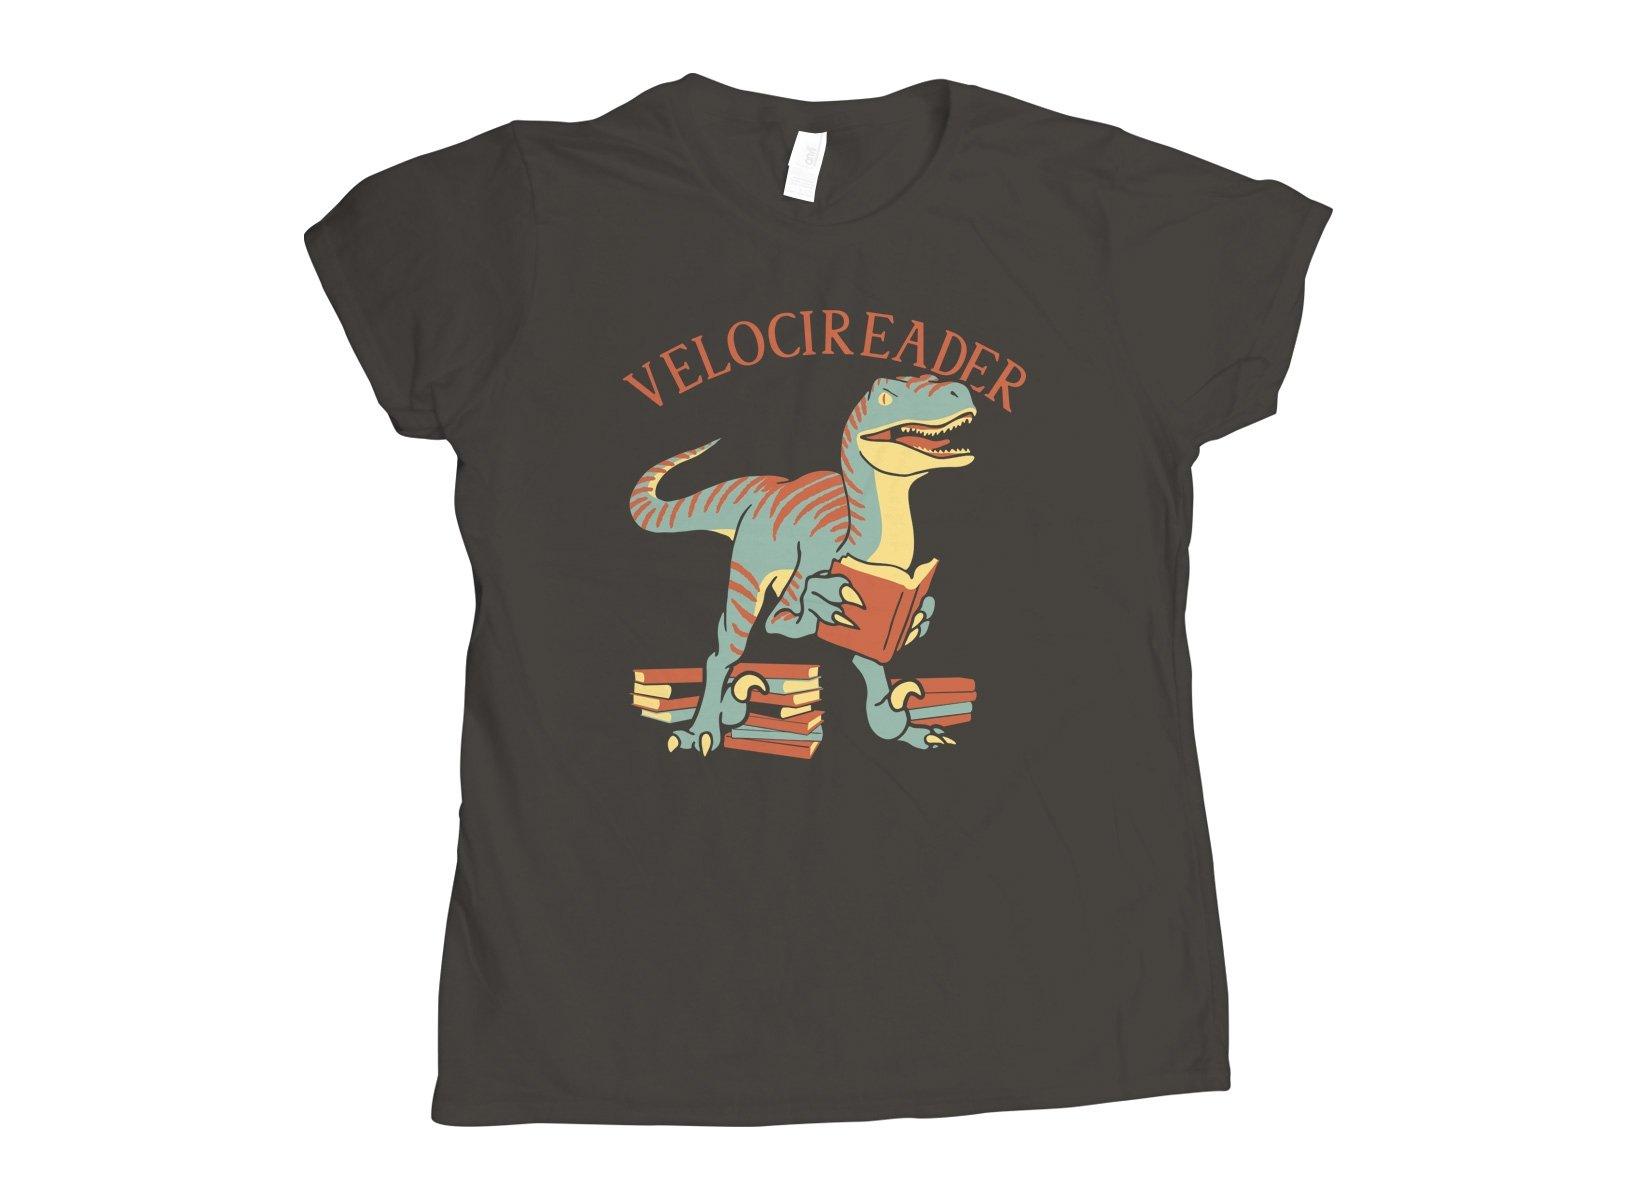 Velocireader on Womens T-Shirt